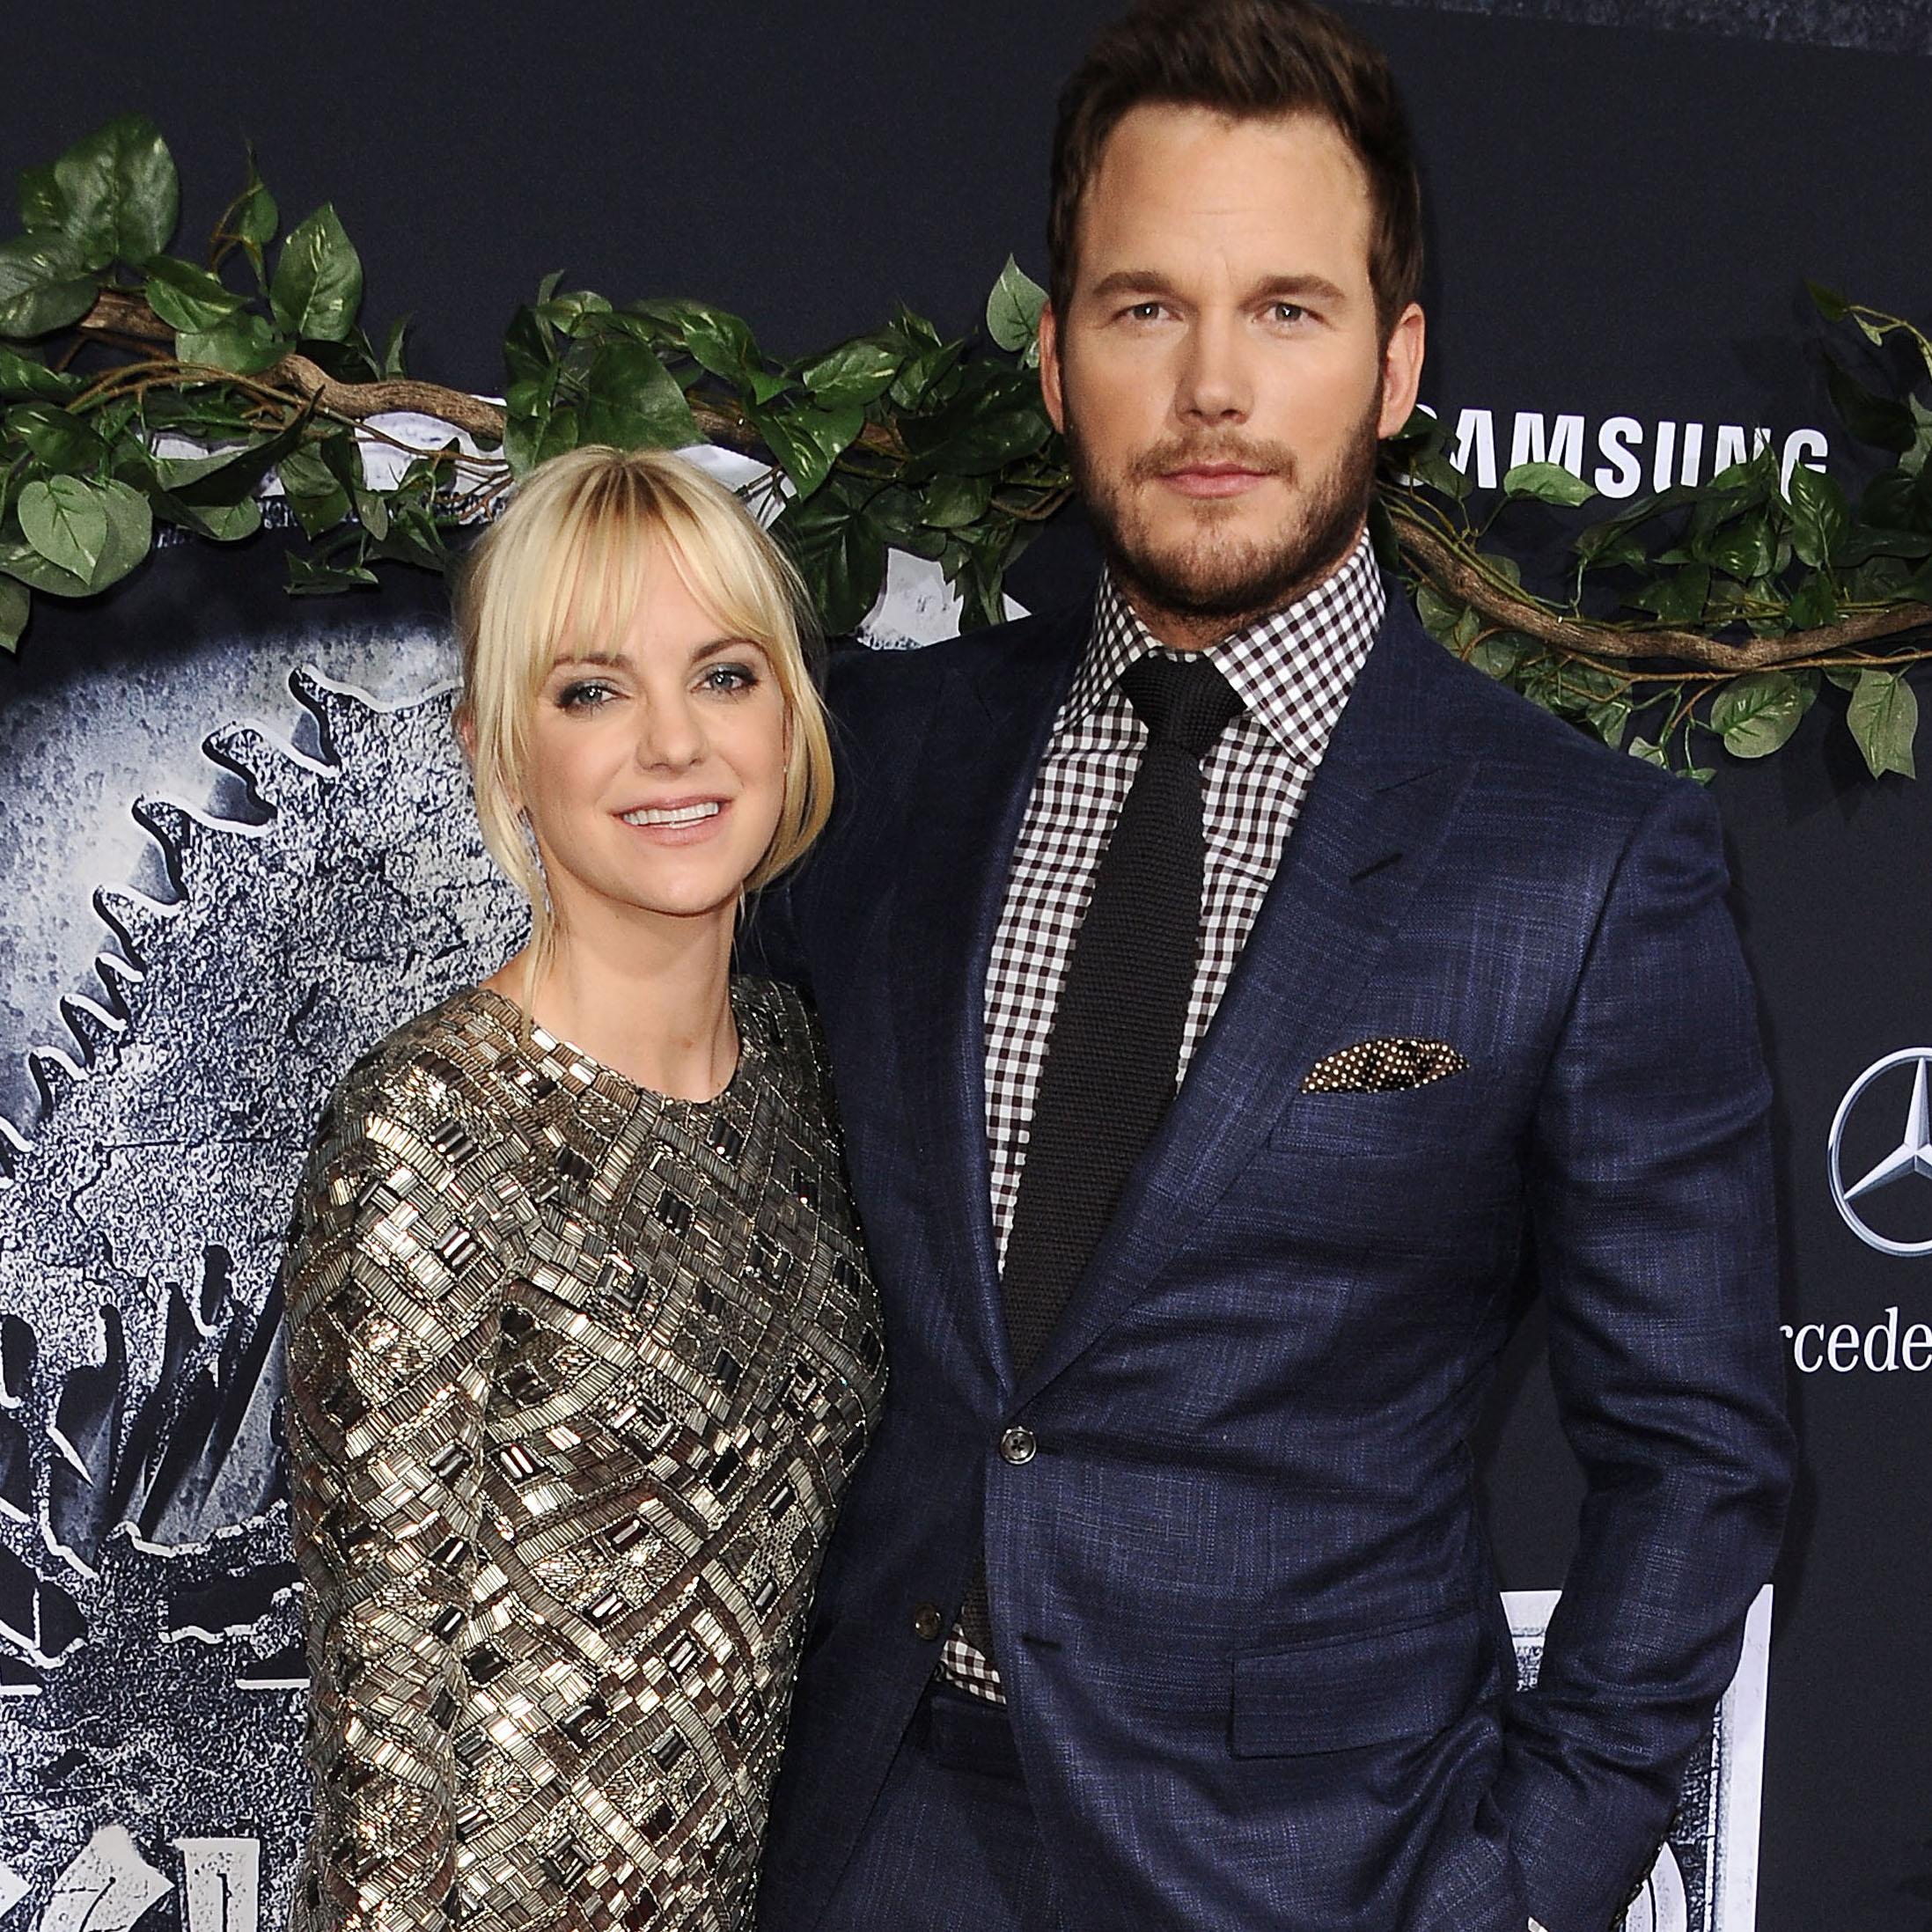 Chris Pratt and Anna Faris Donate $1 Million to Charity